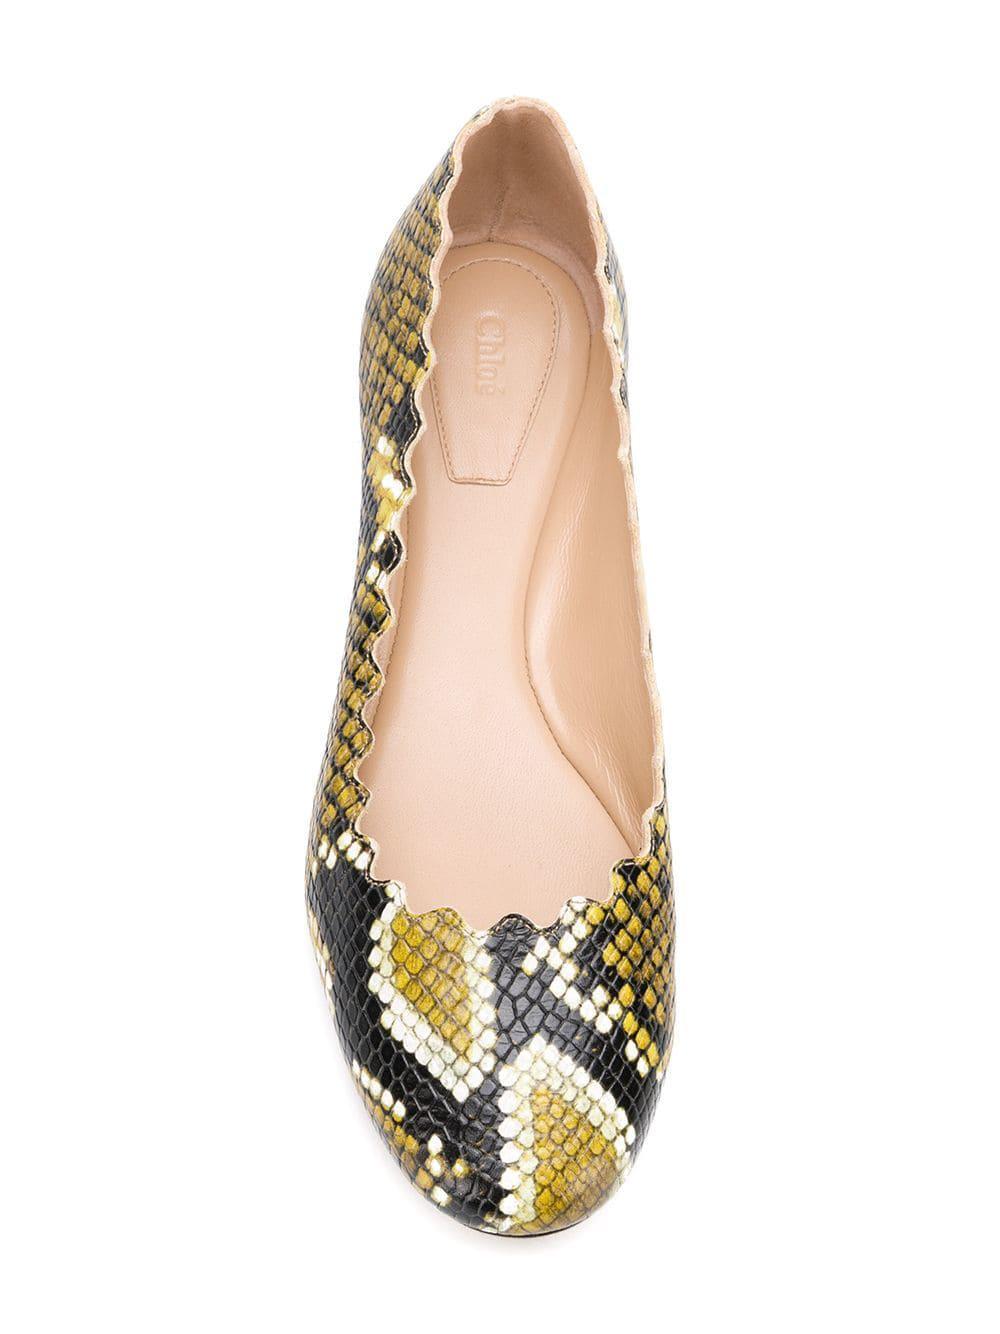 ea3554c19 Chloé - Yellow Lauren Ballerina Shoes - Lyst. View fullscreen